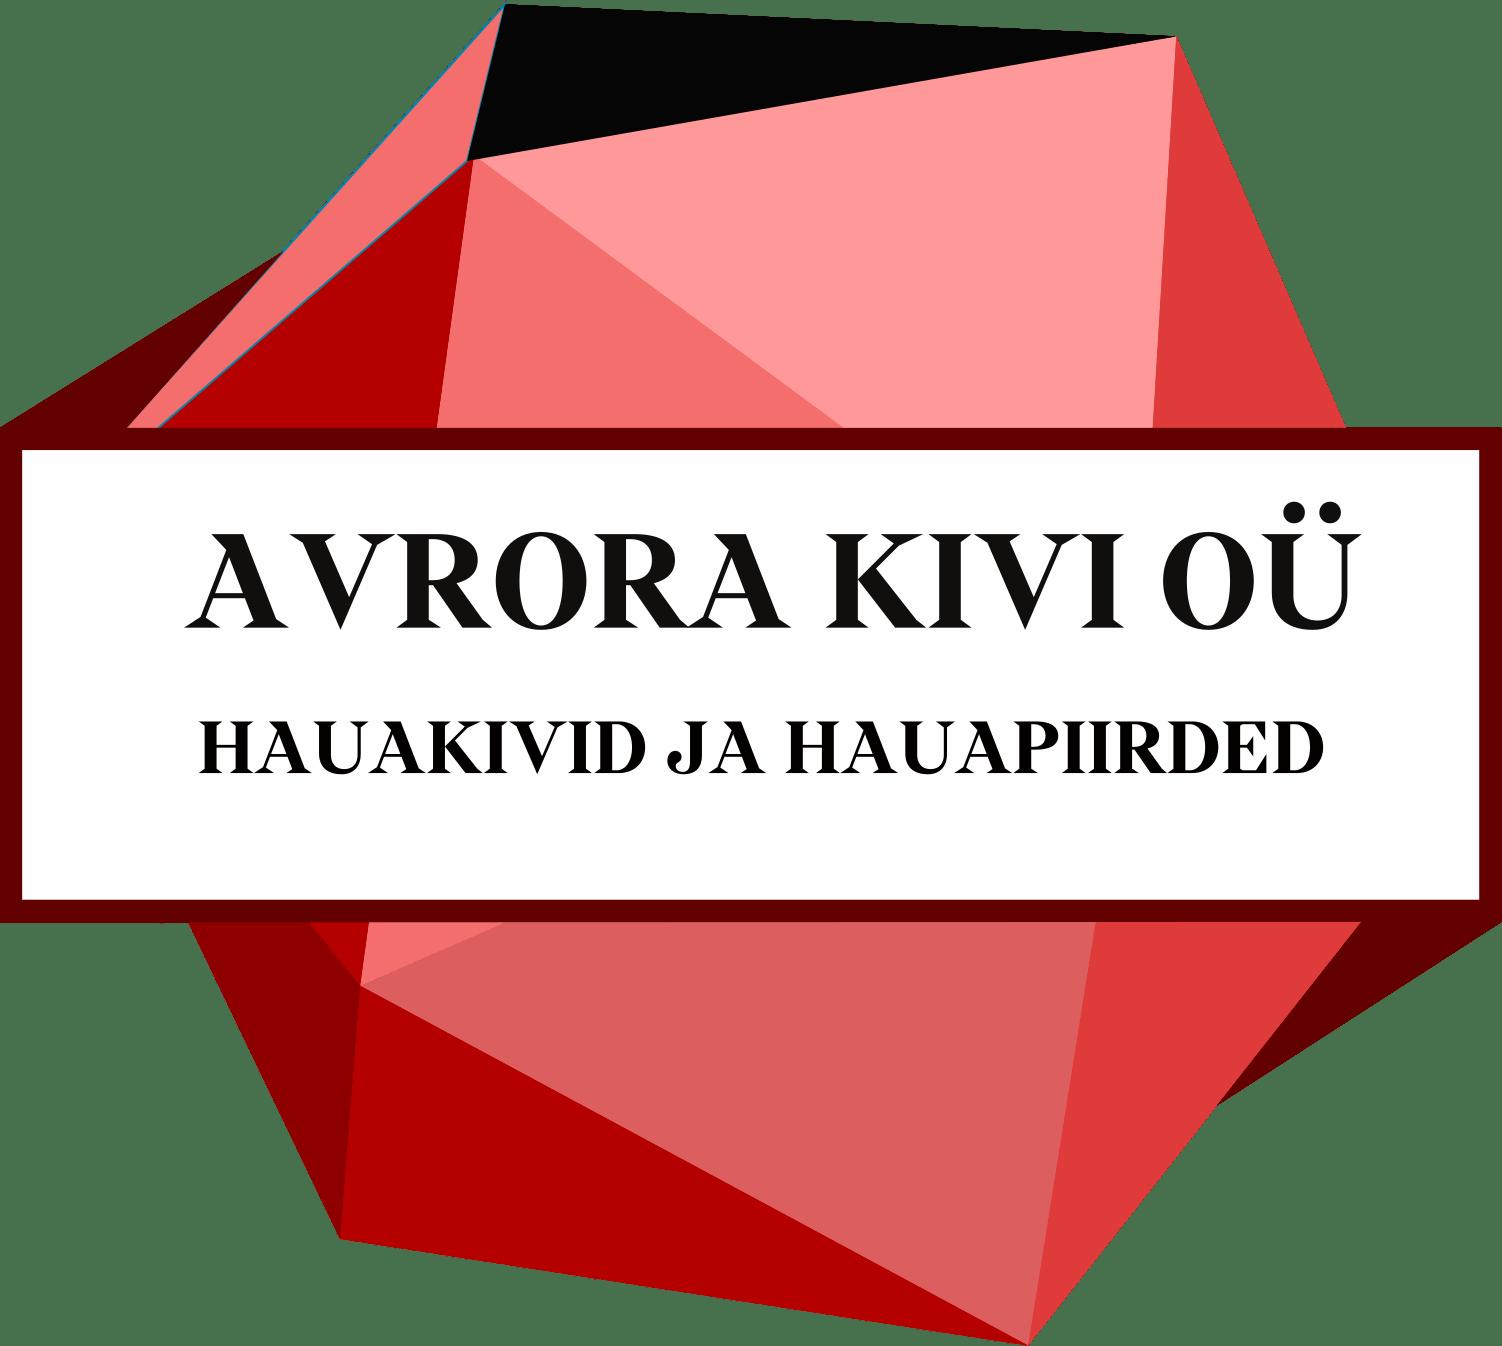 AvroraKivi OÜ